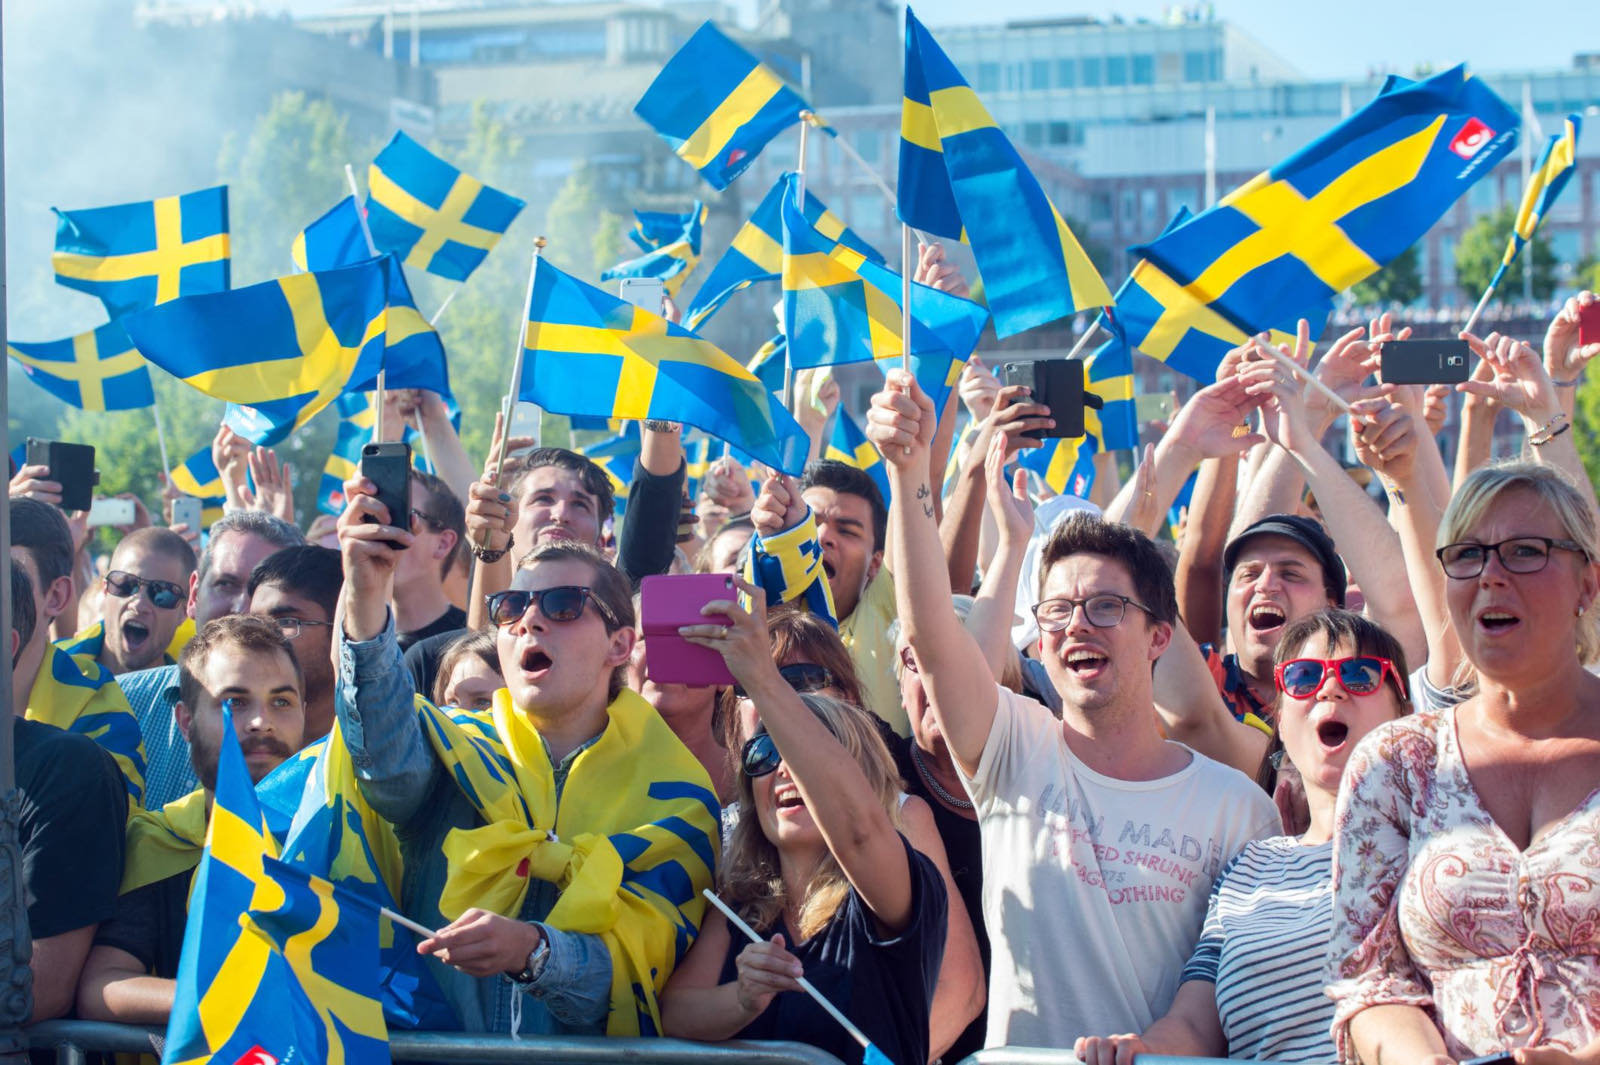 Sports in Sweden